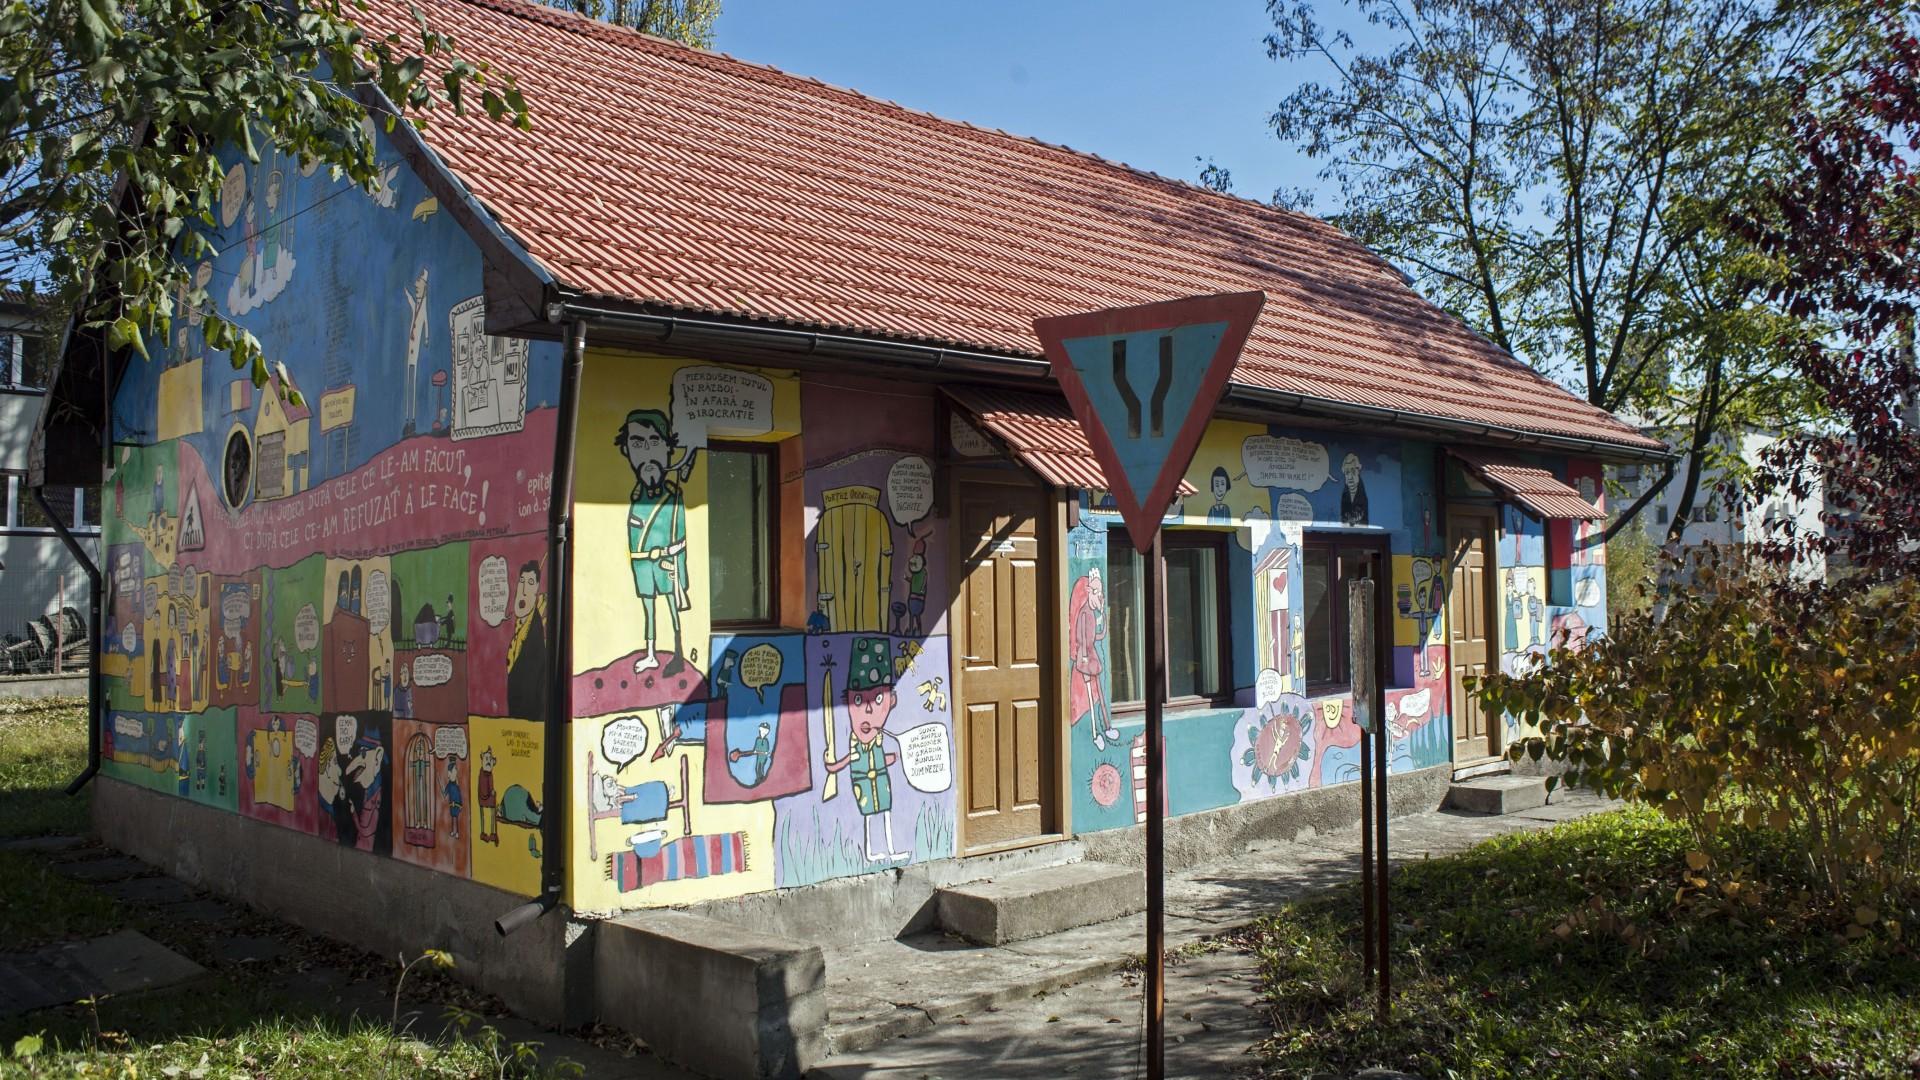 Casa Memorială I.D. Sârbu